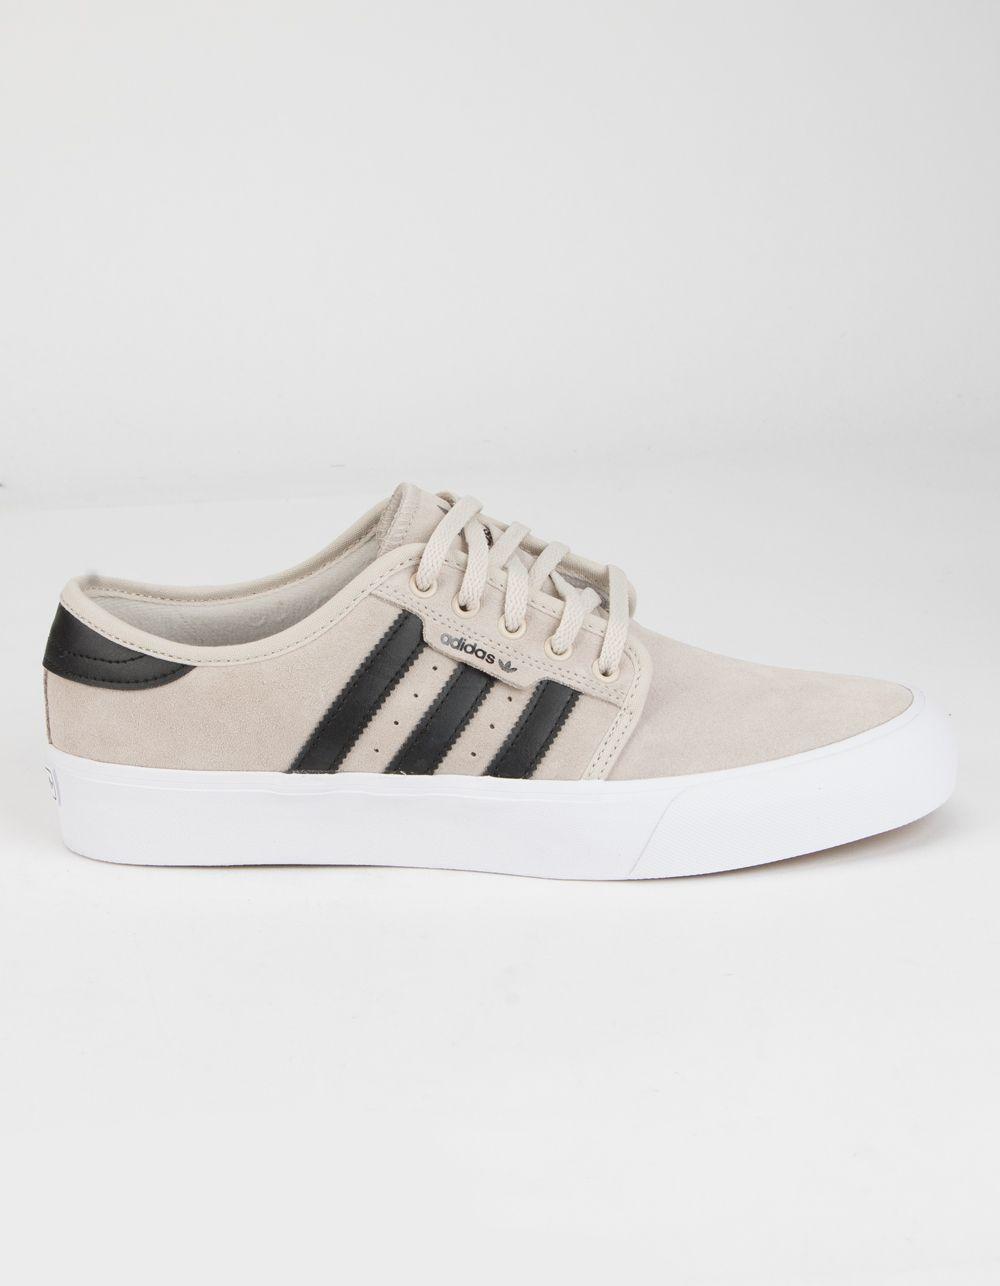 Adidas Seeley Xt Mens Tan Shoes Tan 361306412 Tan Shoes Men Tan Shoes Shoes